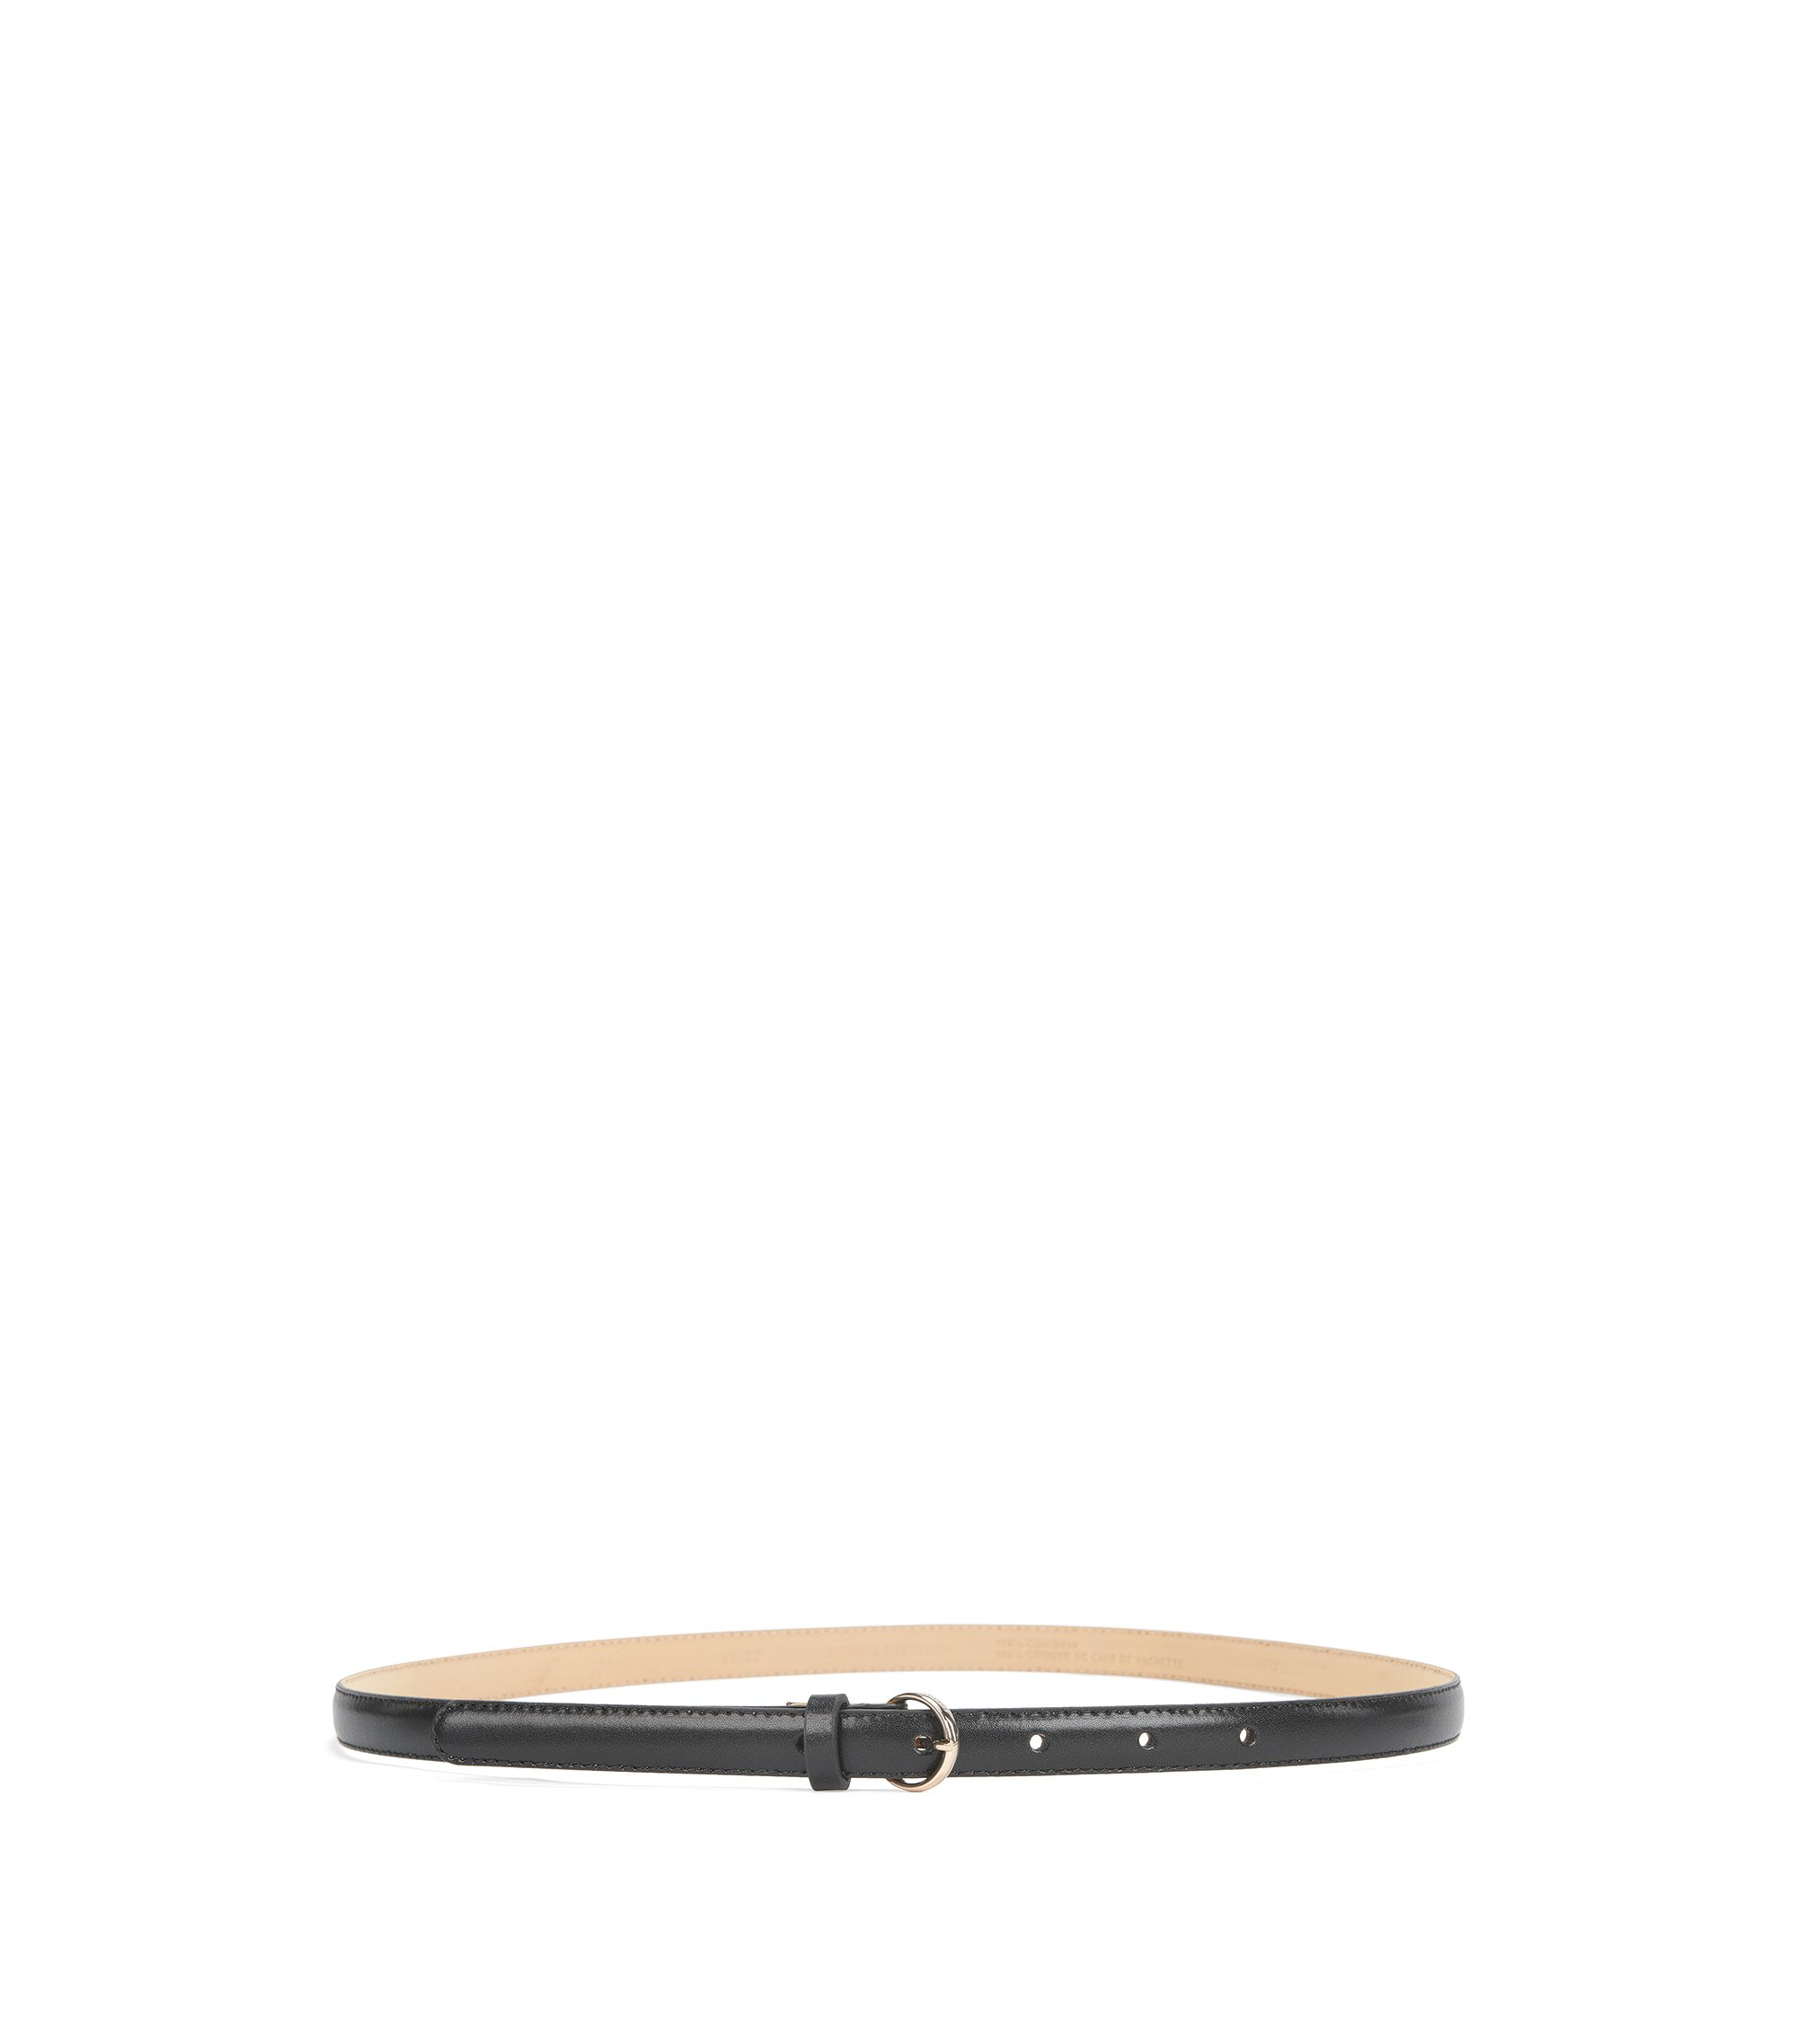 Skinny Leather Belt | Bonnie, Black